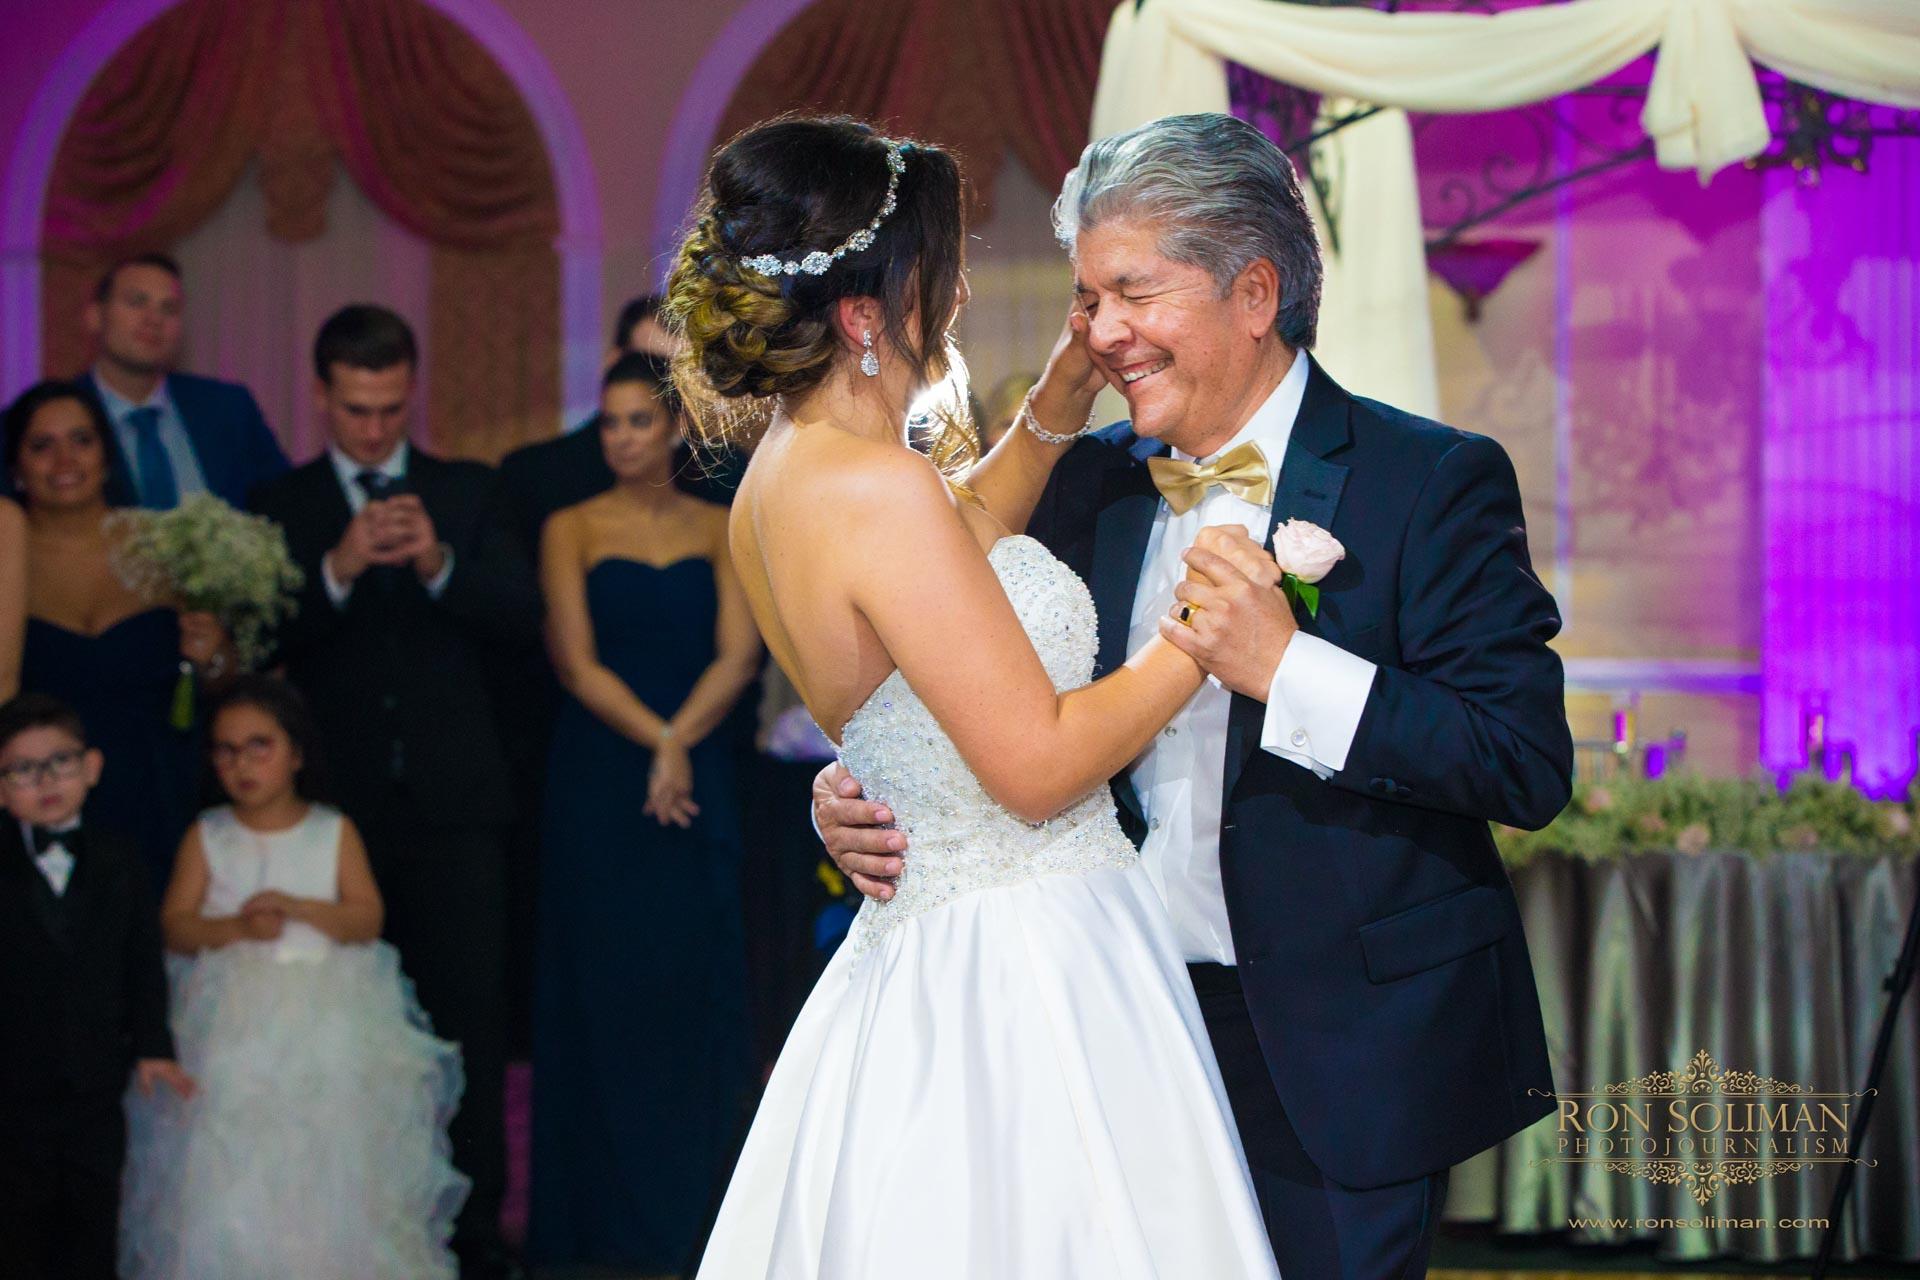 THE MERION WEDDING 27